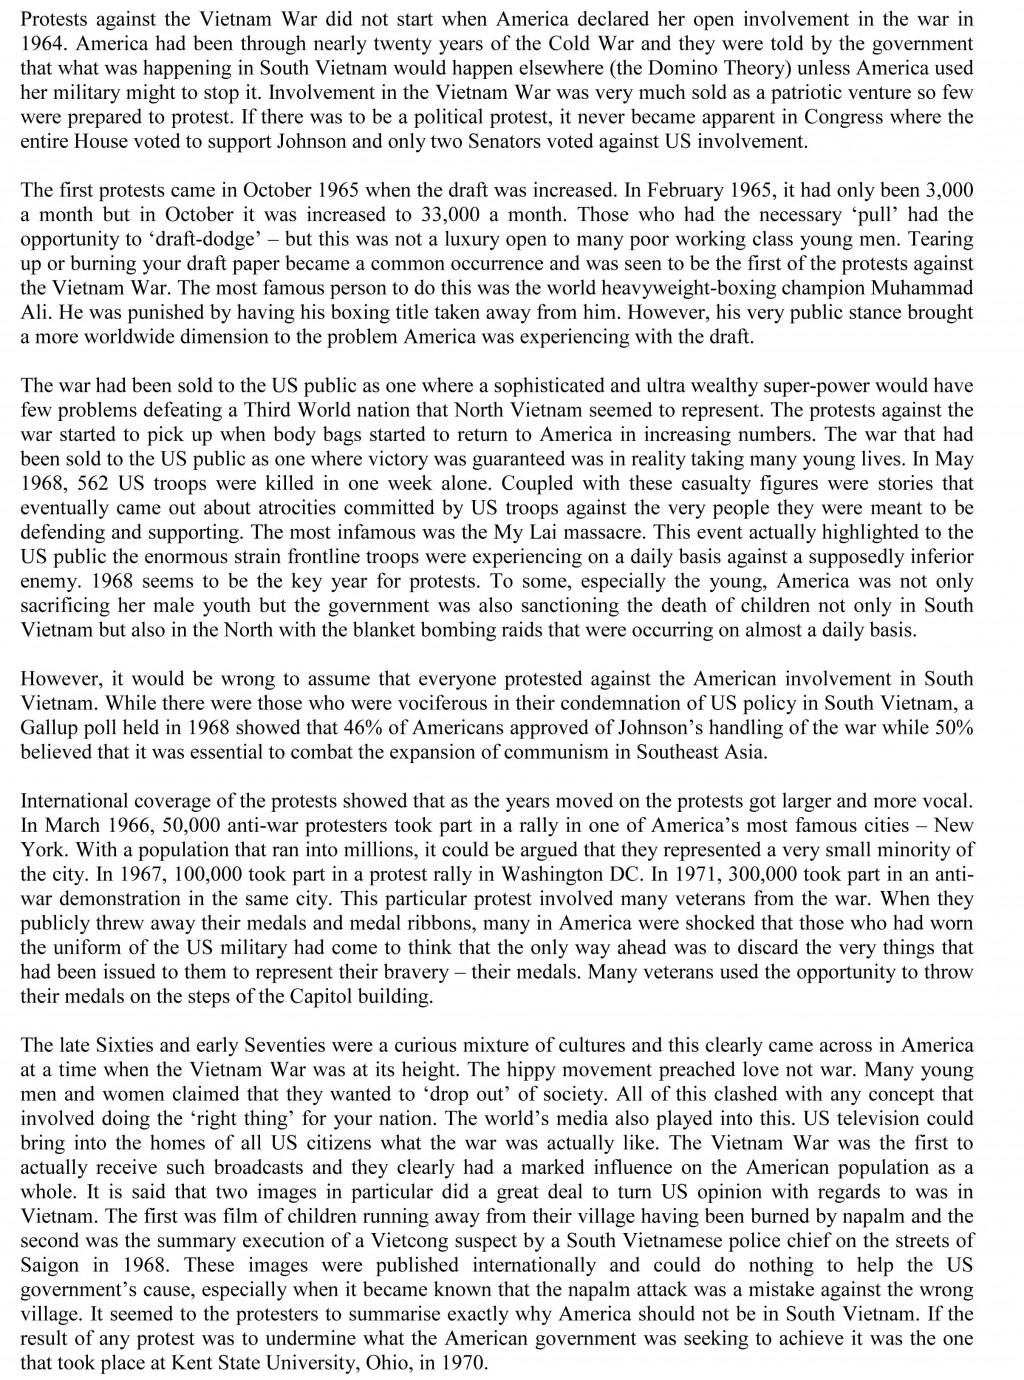 012 Essay Example Vietnam War Narrative Vs Wondrous Descriptive Studymode And Writing Igcse Ppt Large